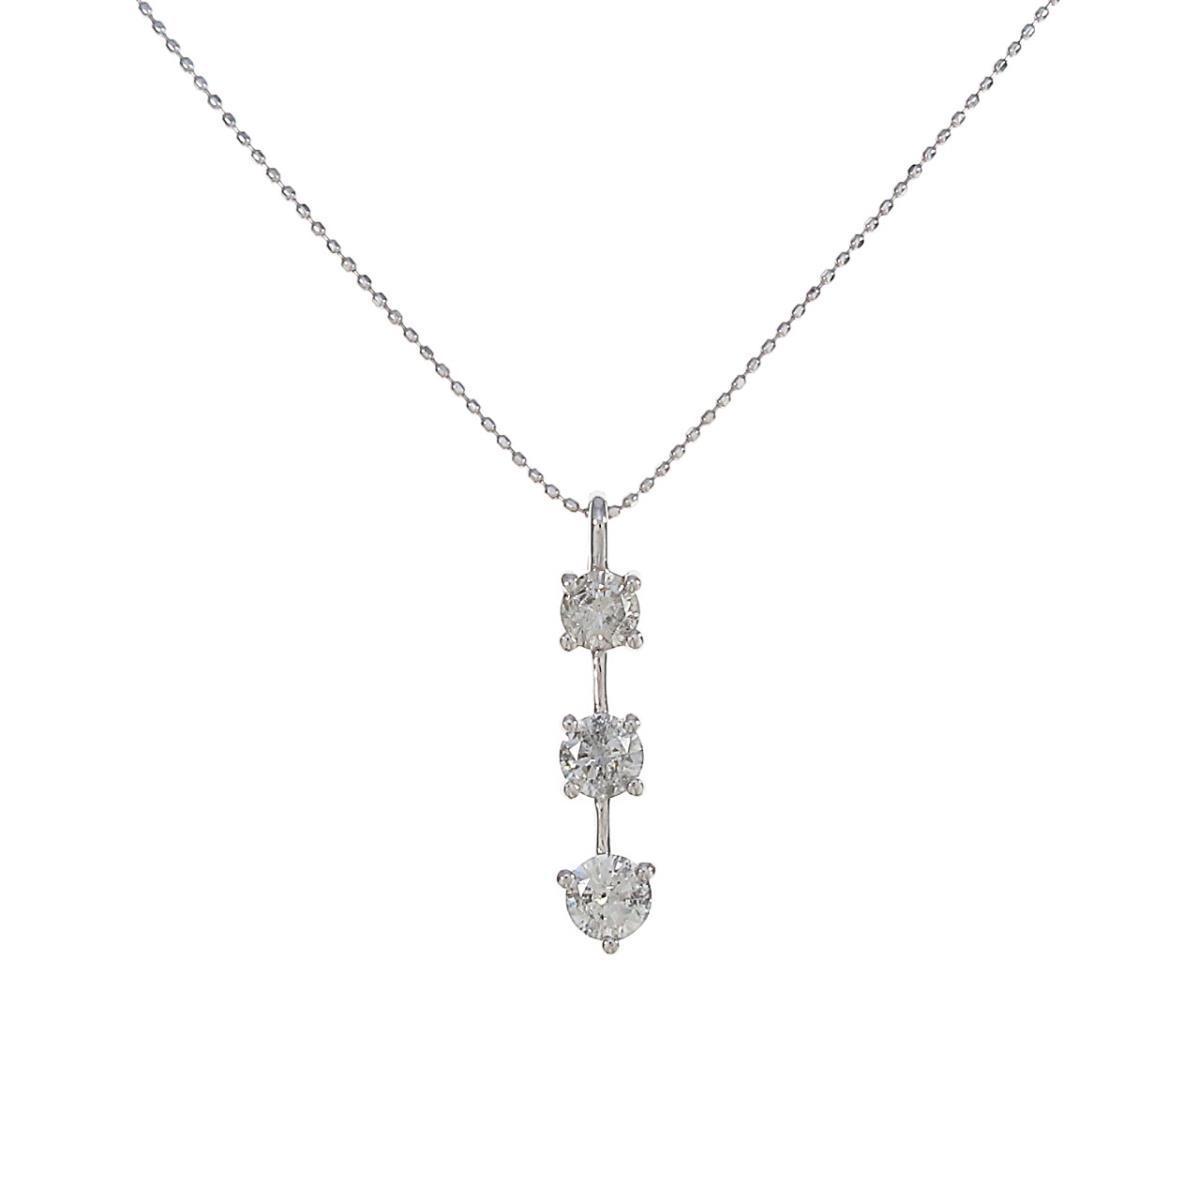 K18WG 祝開店大放出セール開催中 人気ブレゼント ダイヤモンドネックレス 中古